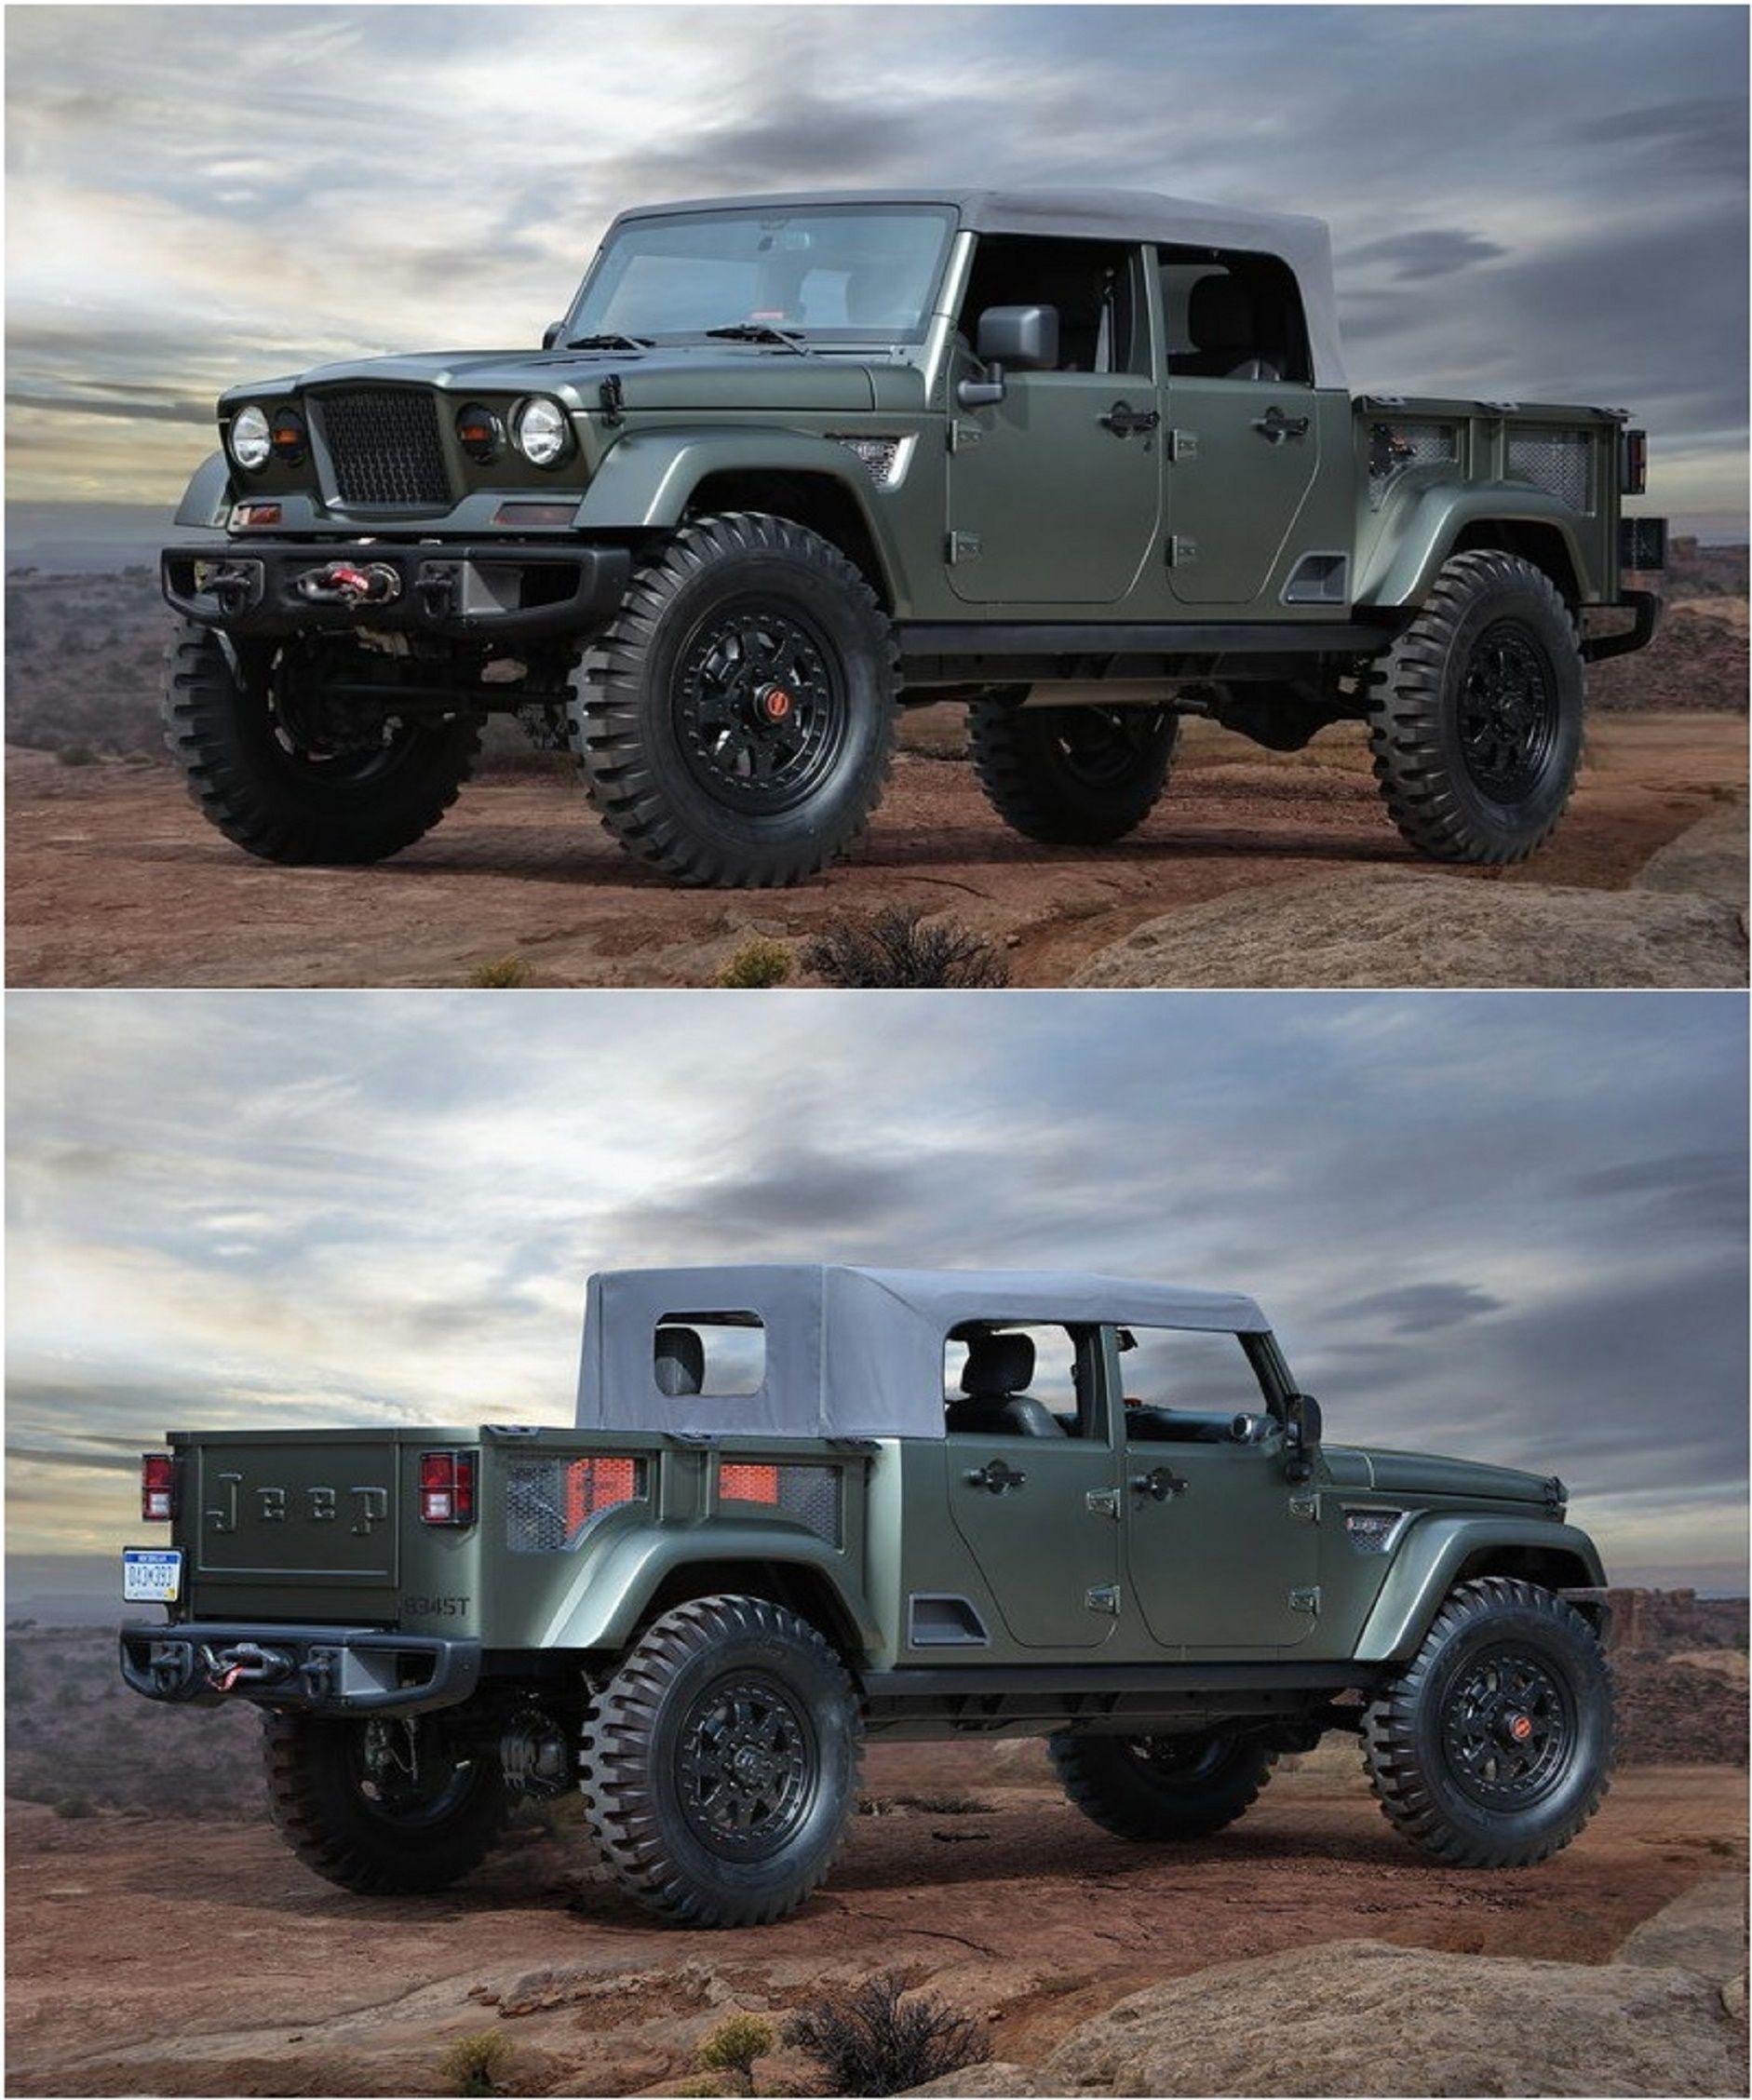 Aev jeep tj brute jeep wrangler yj tj jk pinterest jeep tj jeeps and jeep vehicles